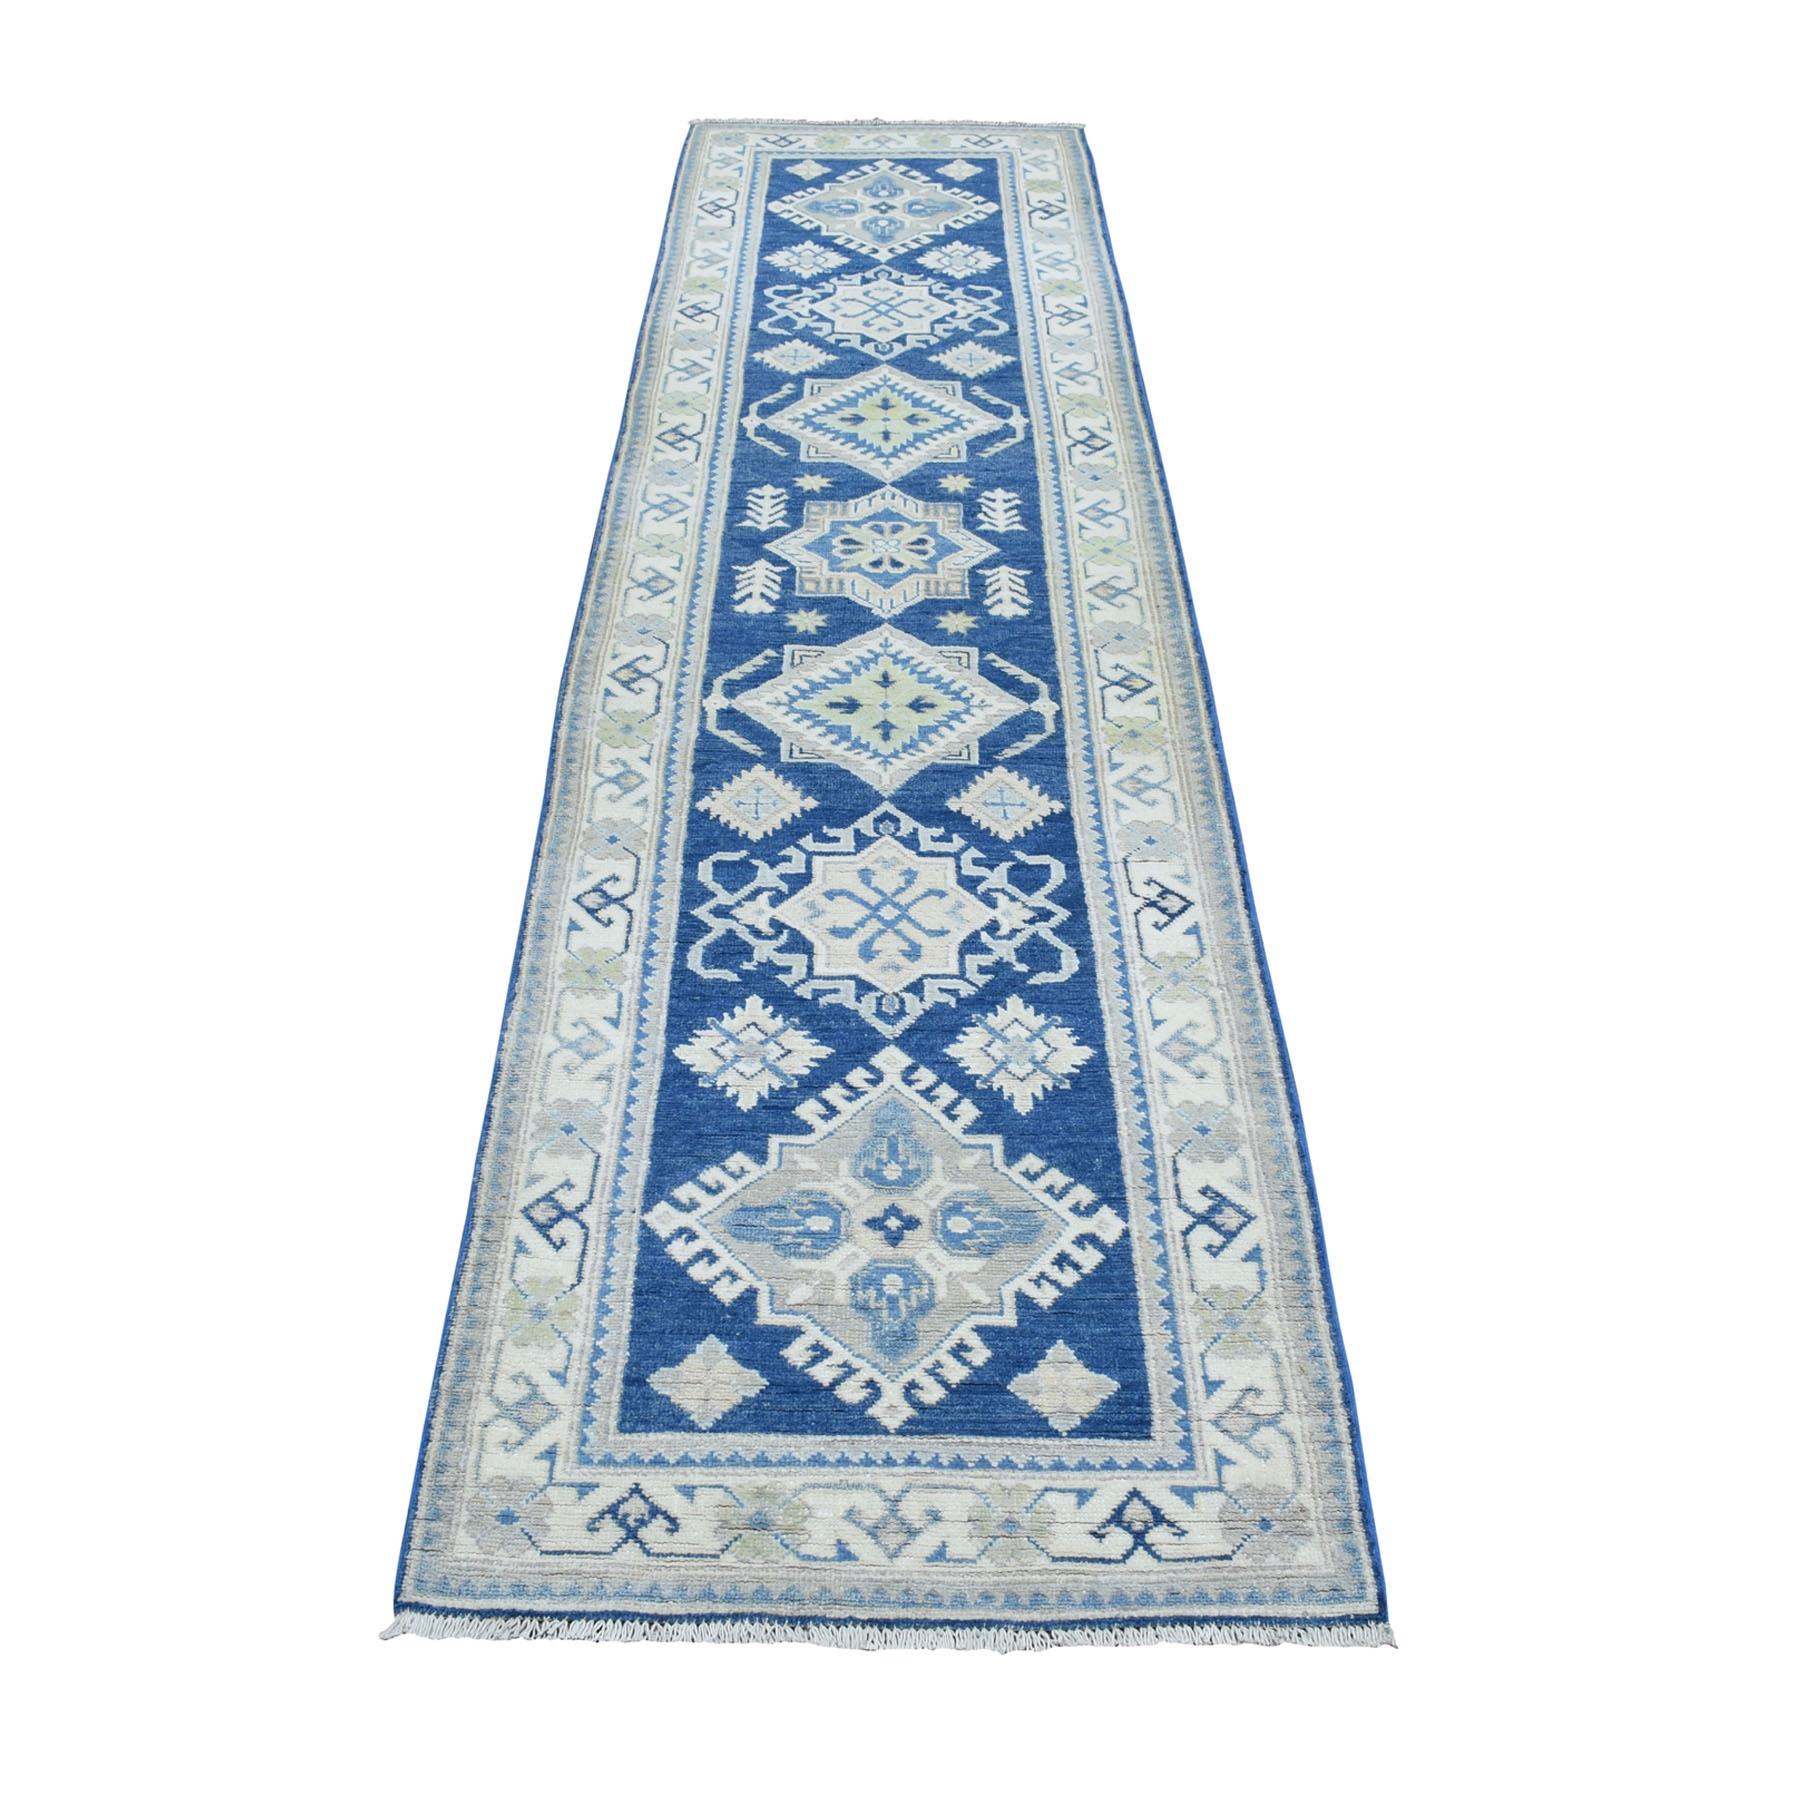 2 8 X9 8 Vintage Look Kazak Geometric Design Blue Runner Pure